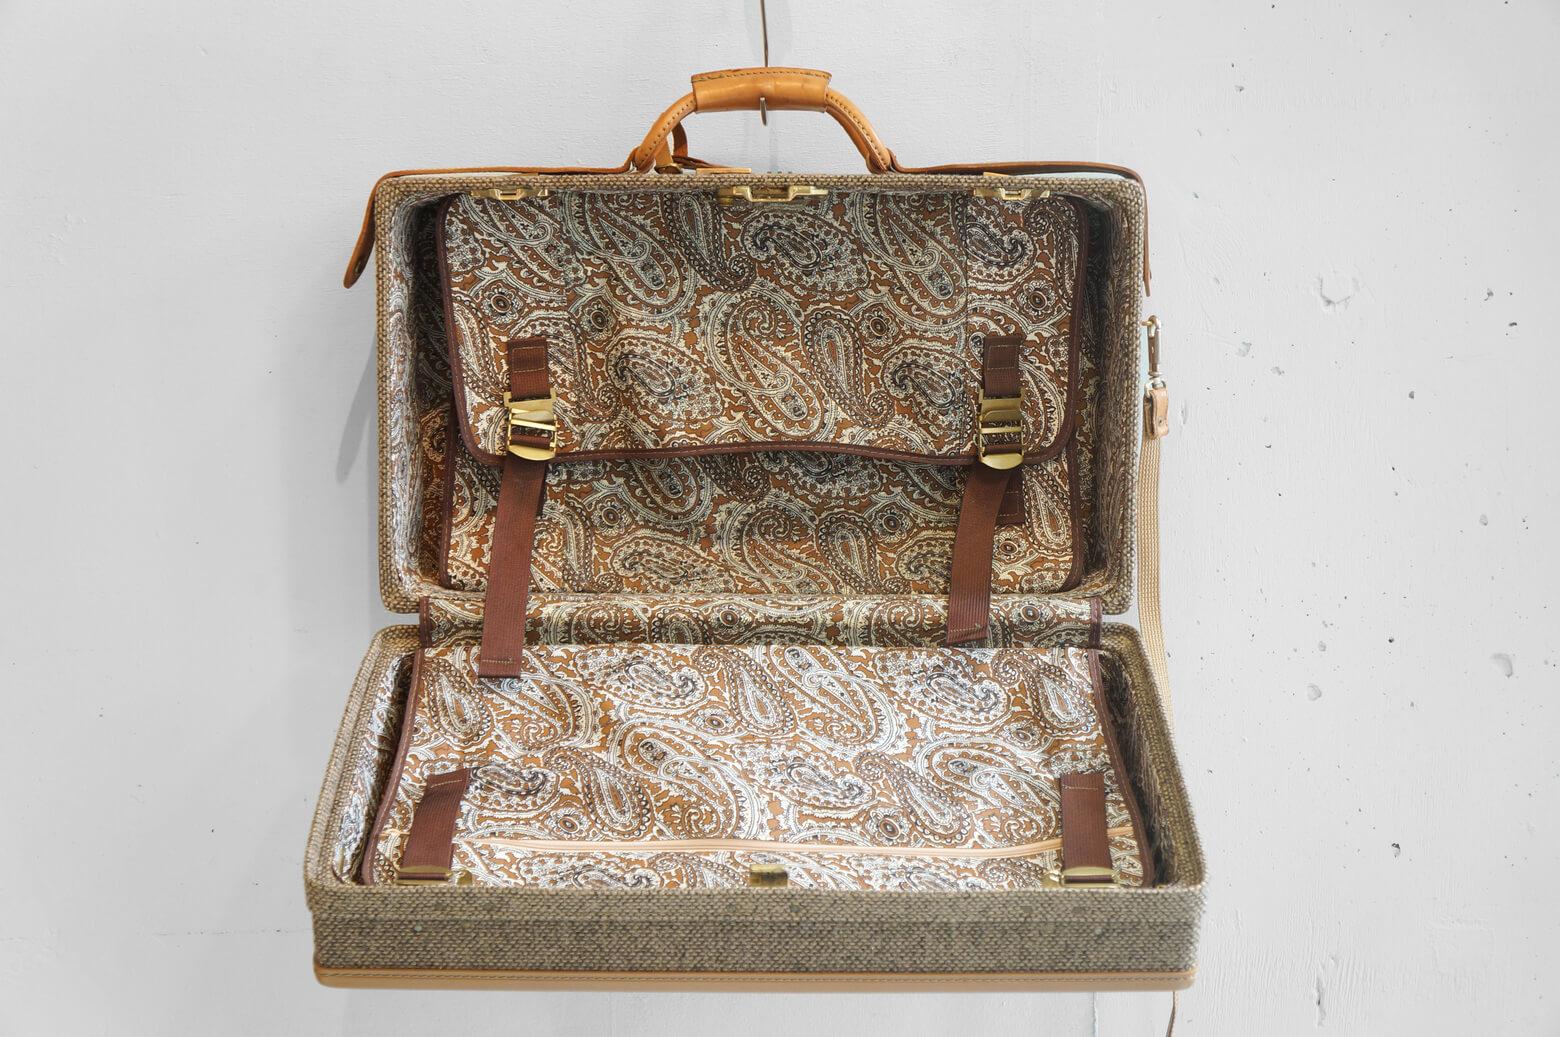 hartmann Vintage TWEED BELTING Travel Bag/ハートマン ヴィンテージ ツイードベルティング トラベルバッグ 小